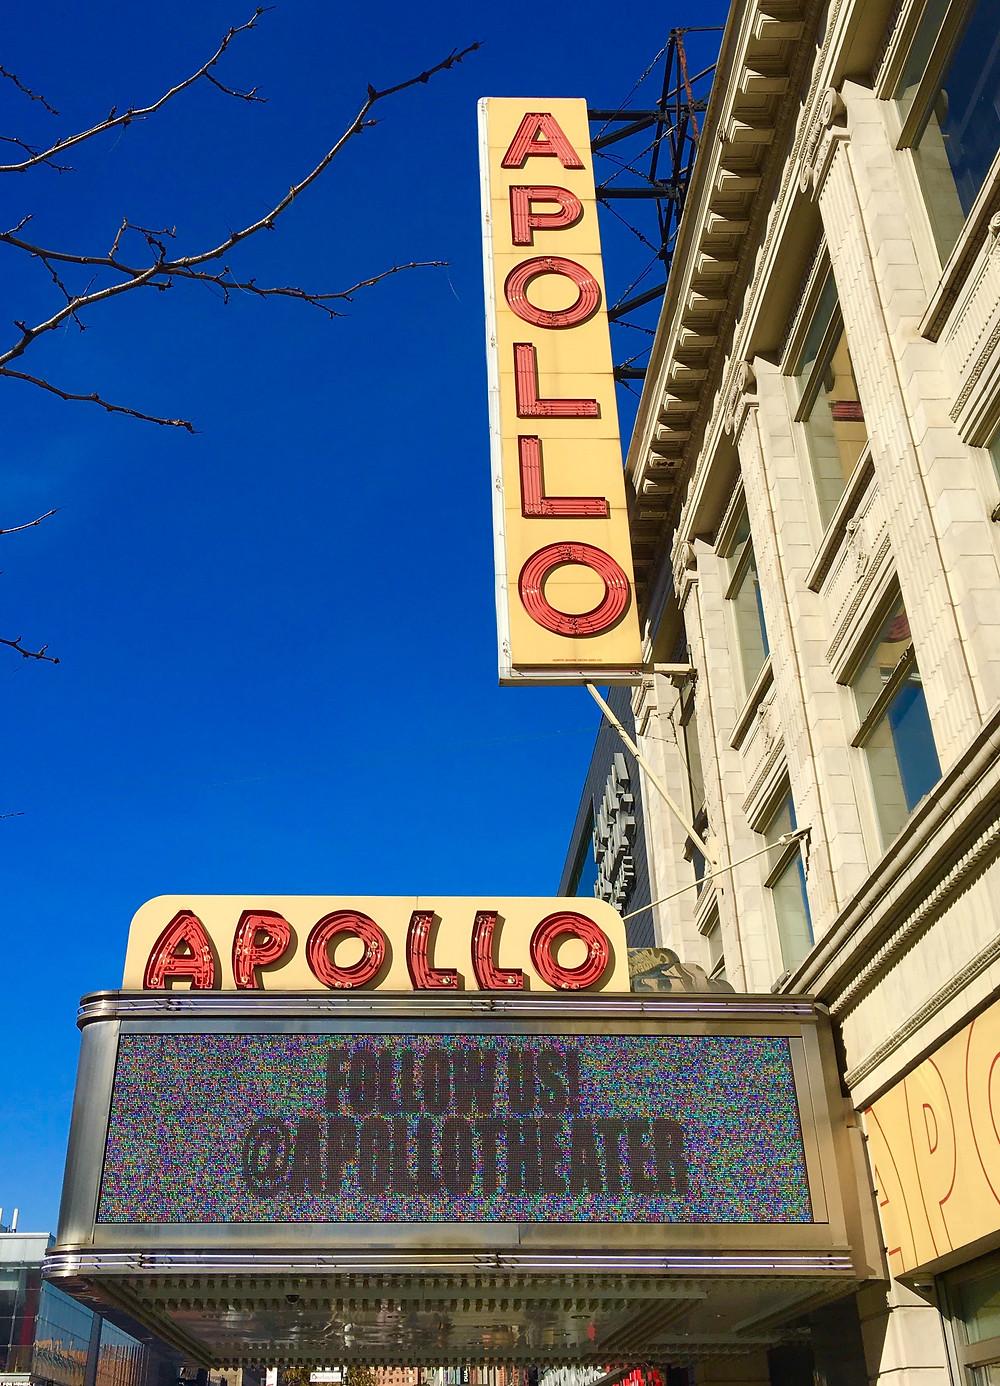 The Apollo Theater in Harlem